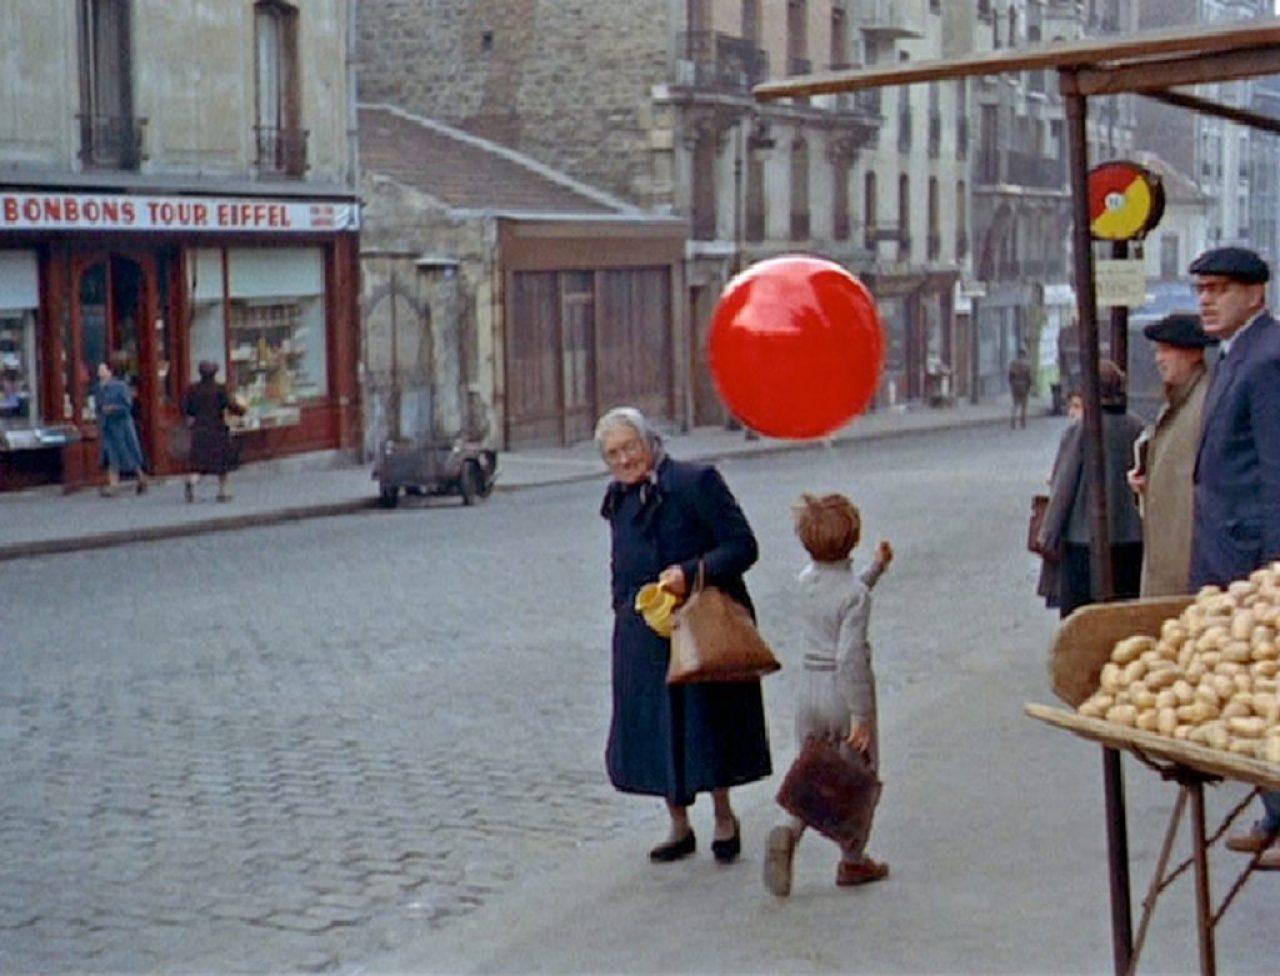 Rue-de-Menilmontant1-1280